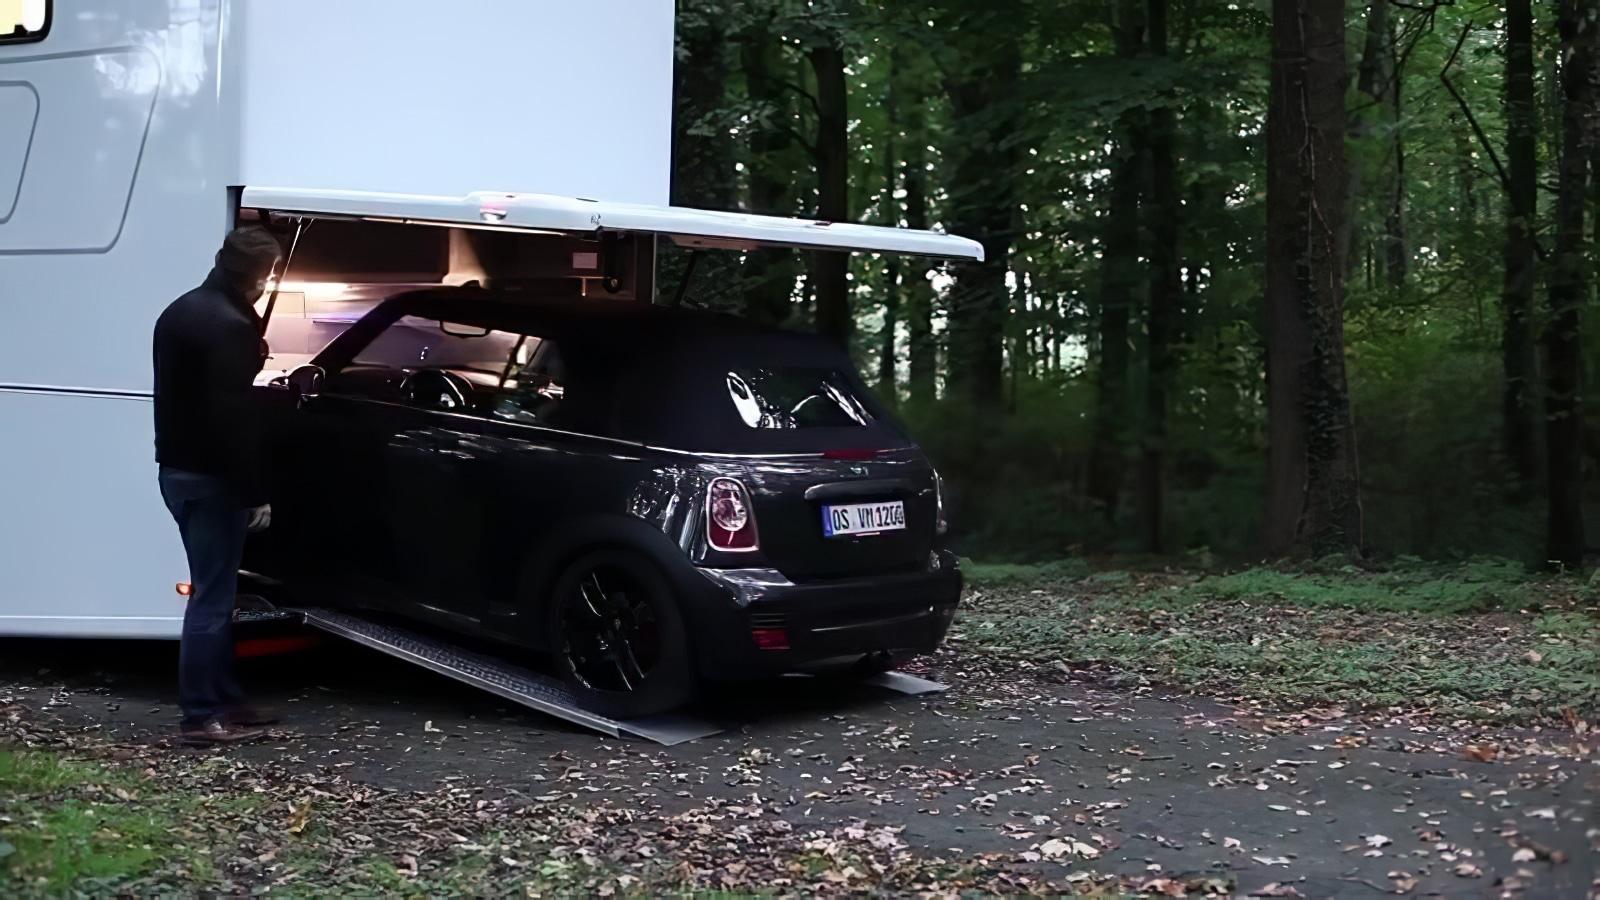 vario mobil le camping car de luxe digne des plus grands. Black Bedroom Furniture Sets. Home Design Ideas